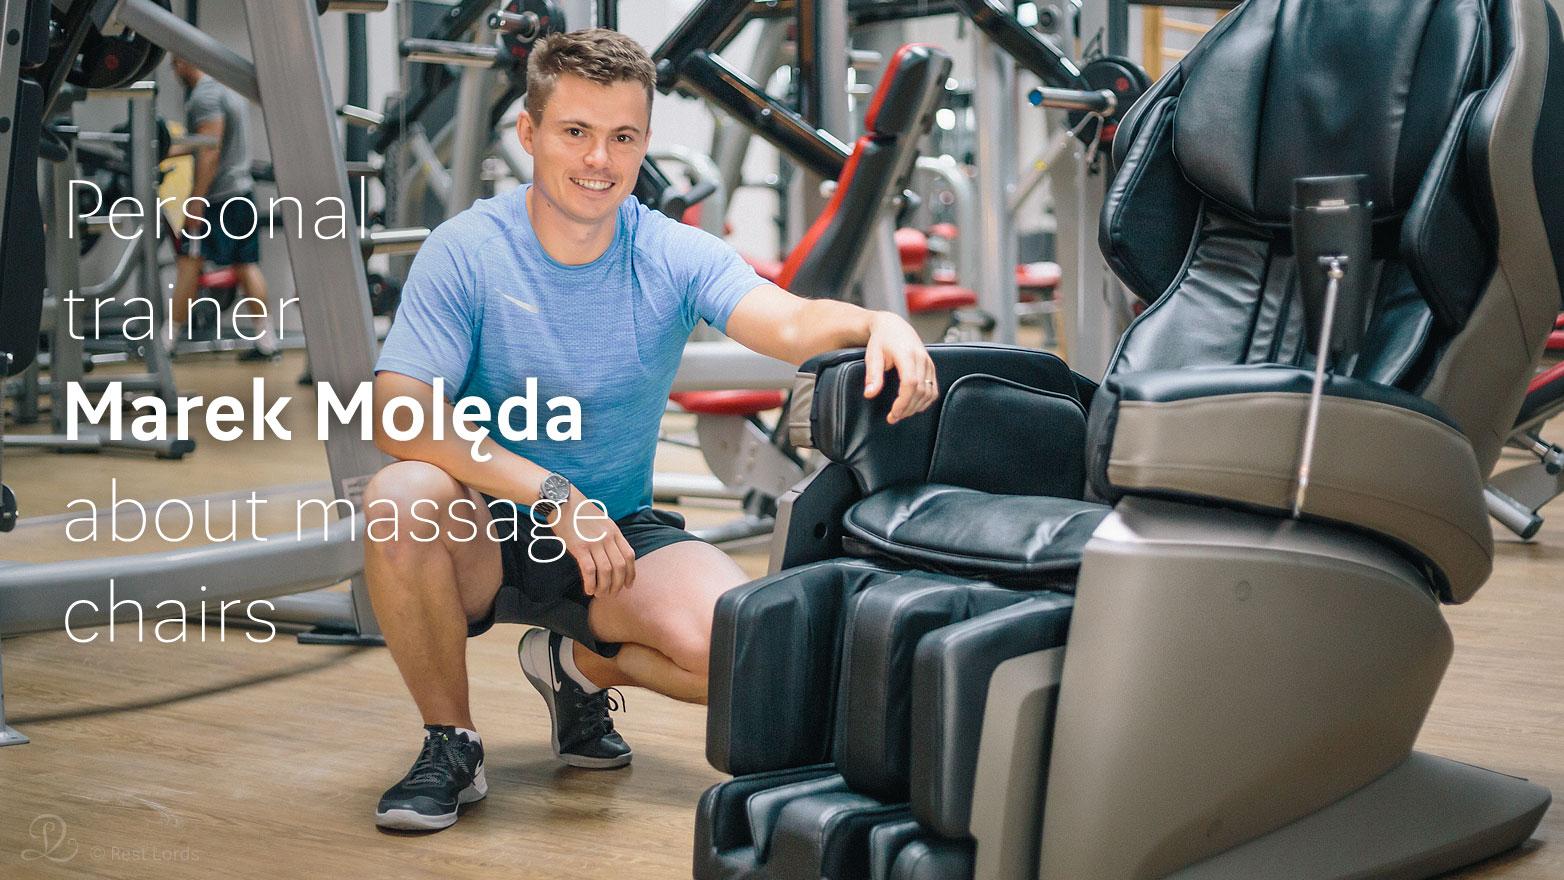 Massage chair at gym